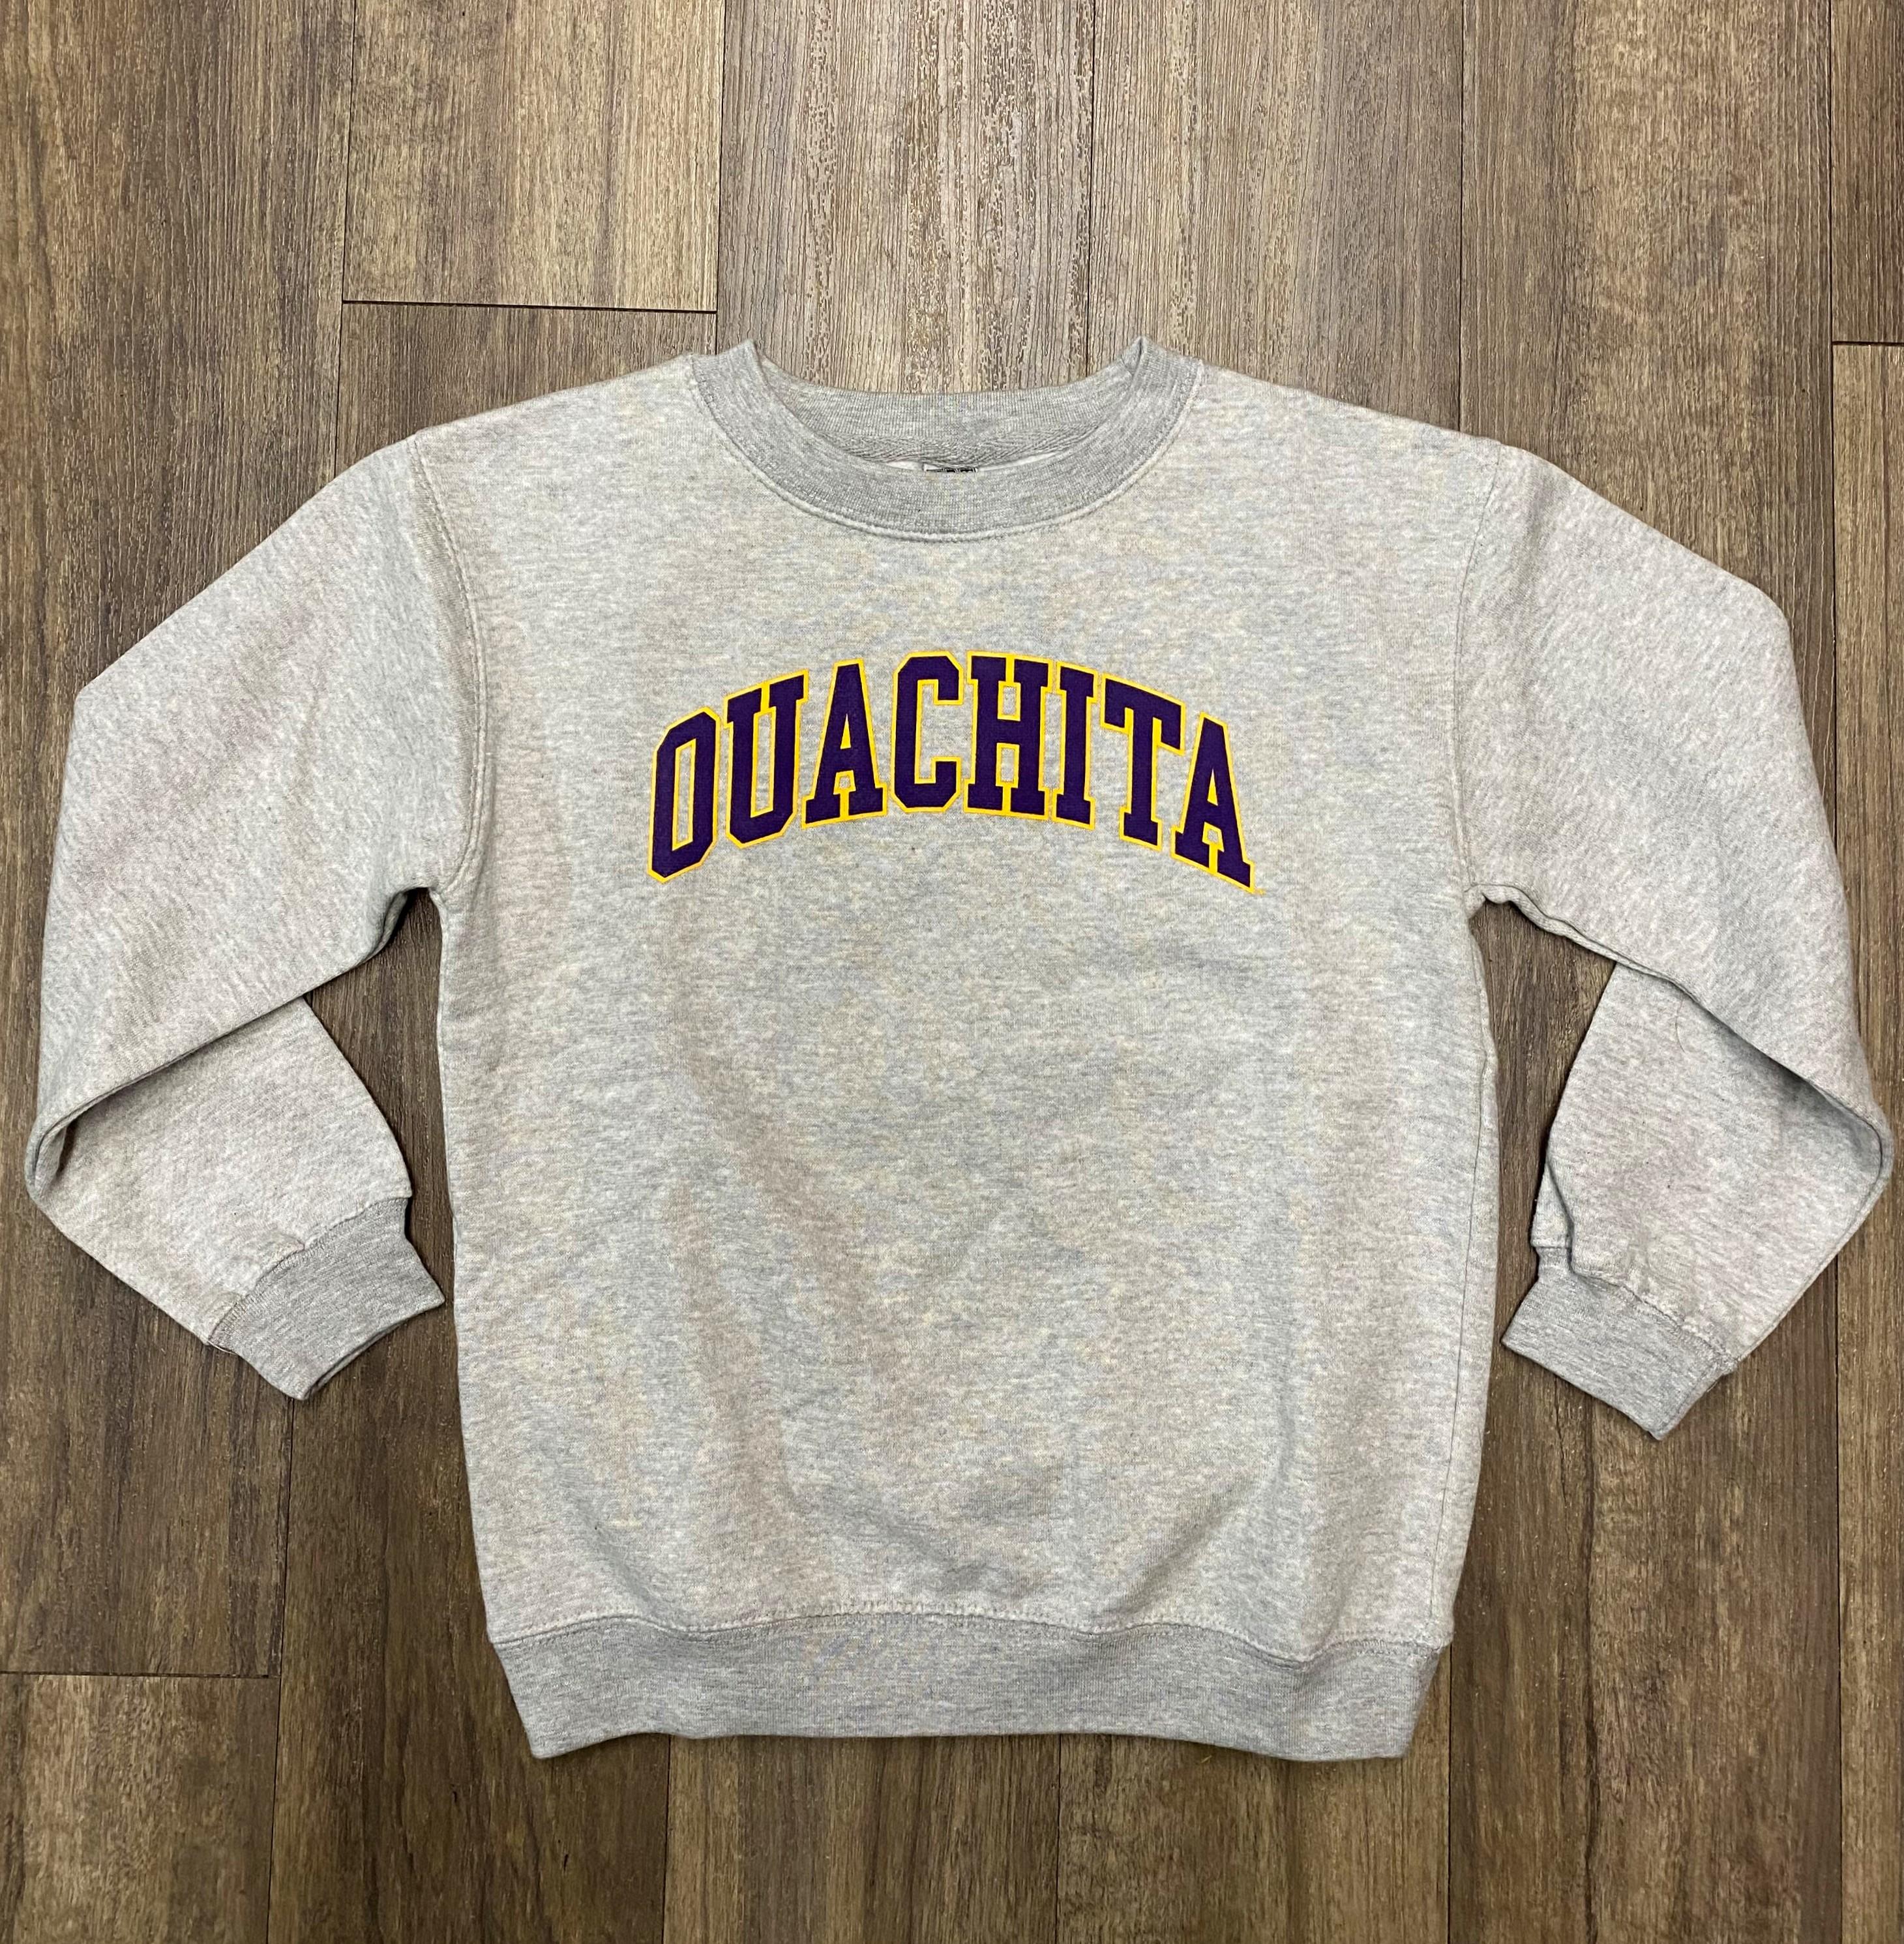 image of: YOUTH OUACHITA CREW SWEATSHIRT